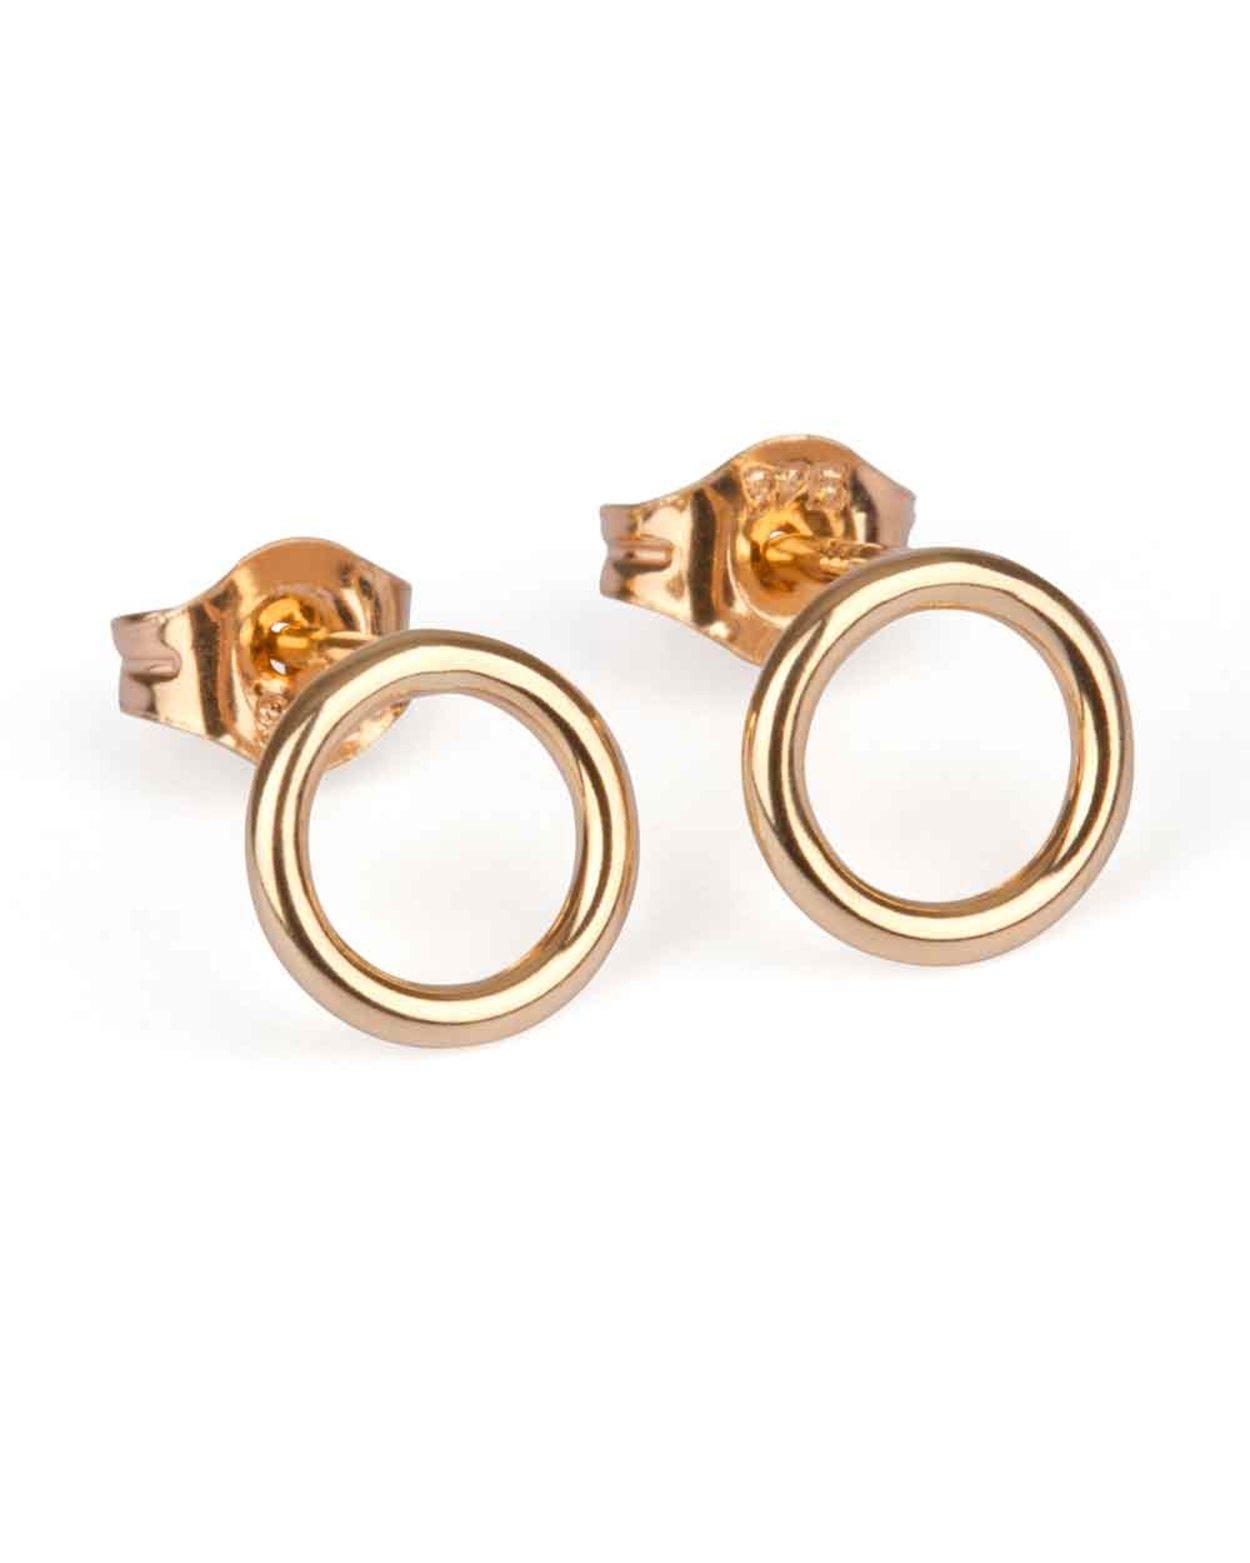 9kt Gold Circle Stud Earrings